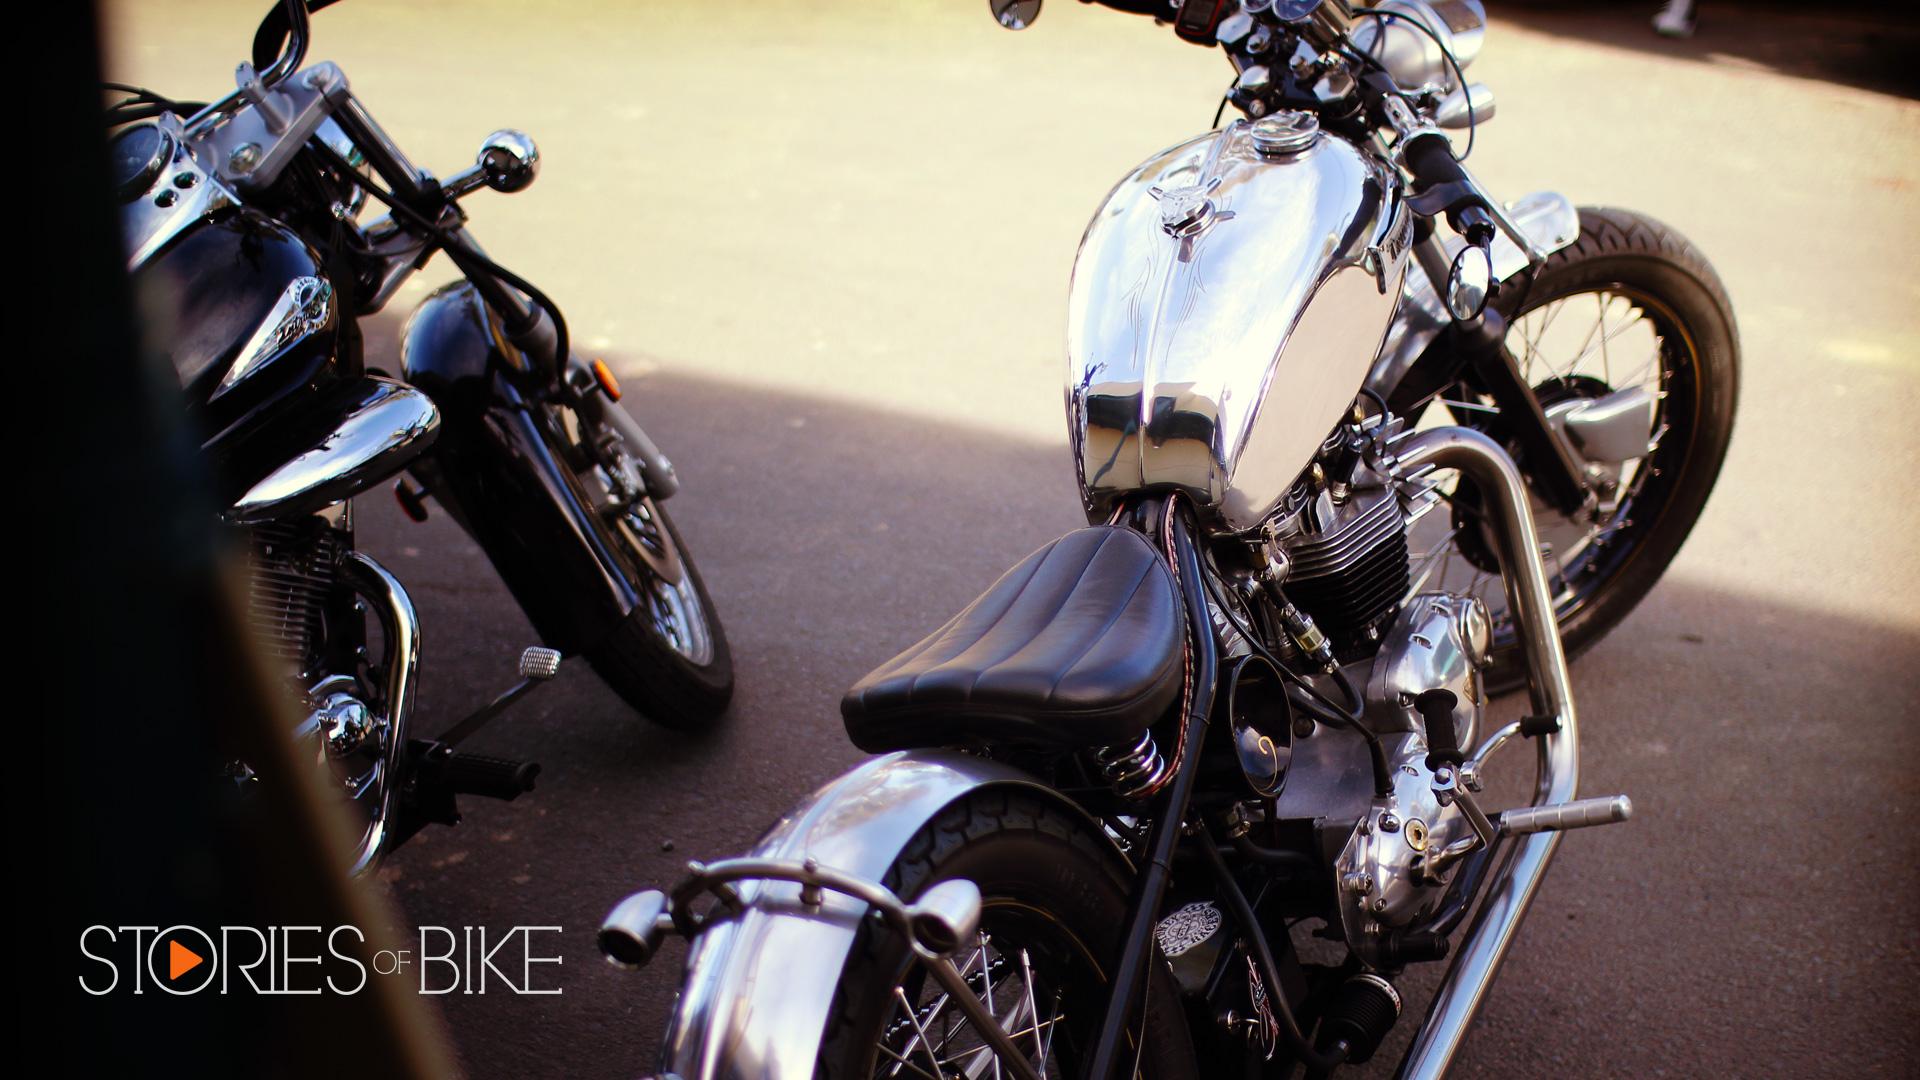 Stories_of_Bike_Publicity_Ep7_5.jpg